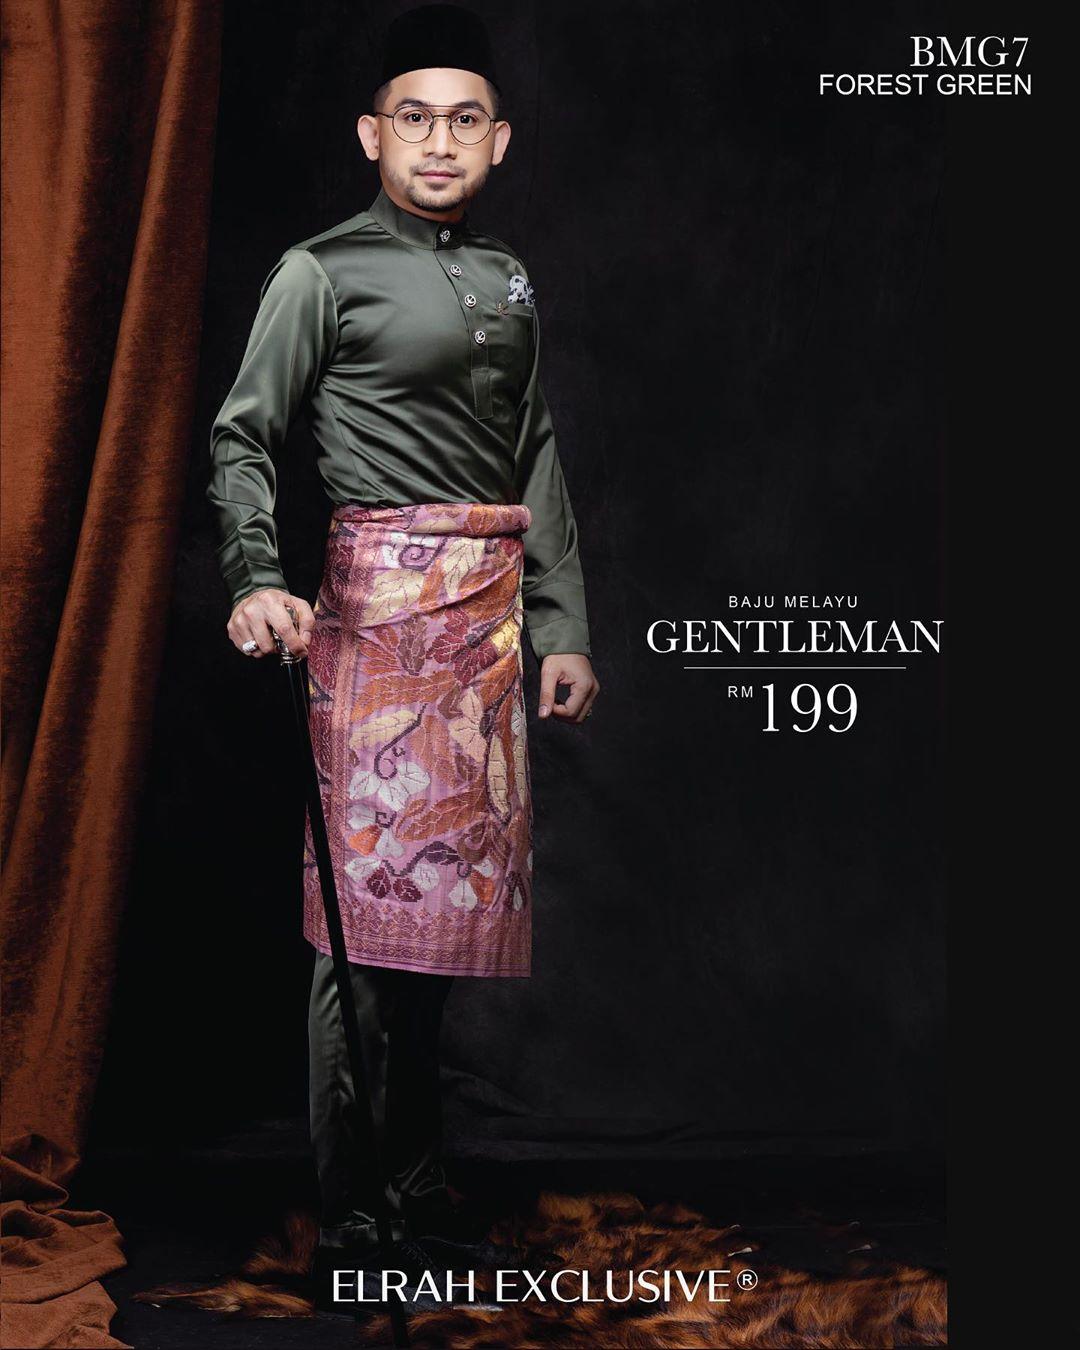 Baju Melayu Gentleman Forest Green